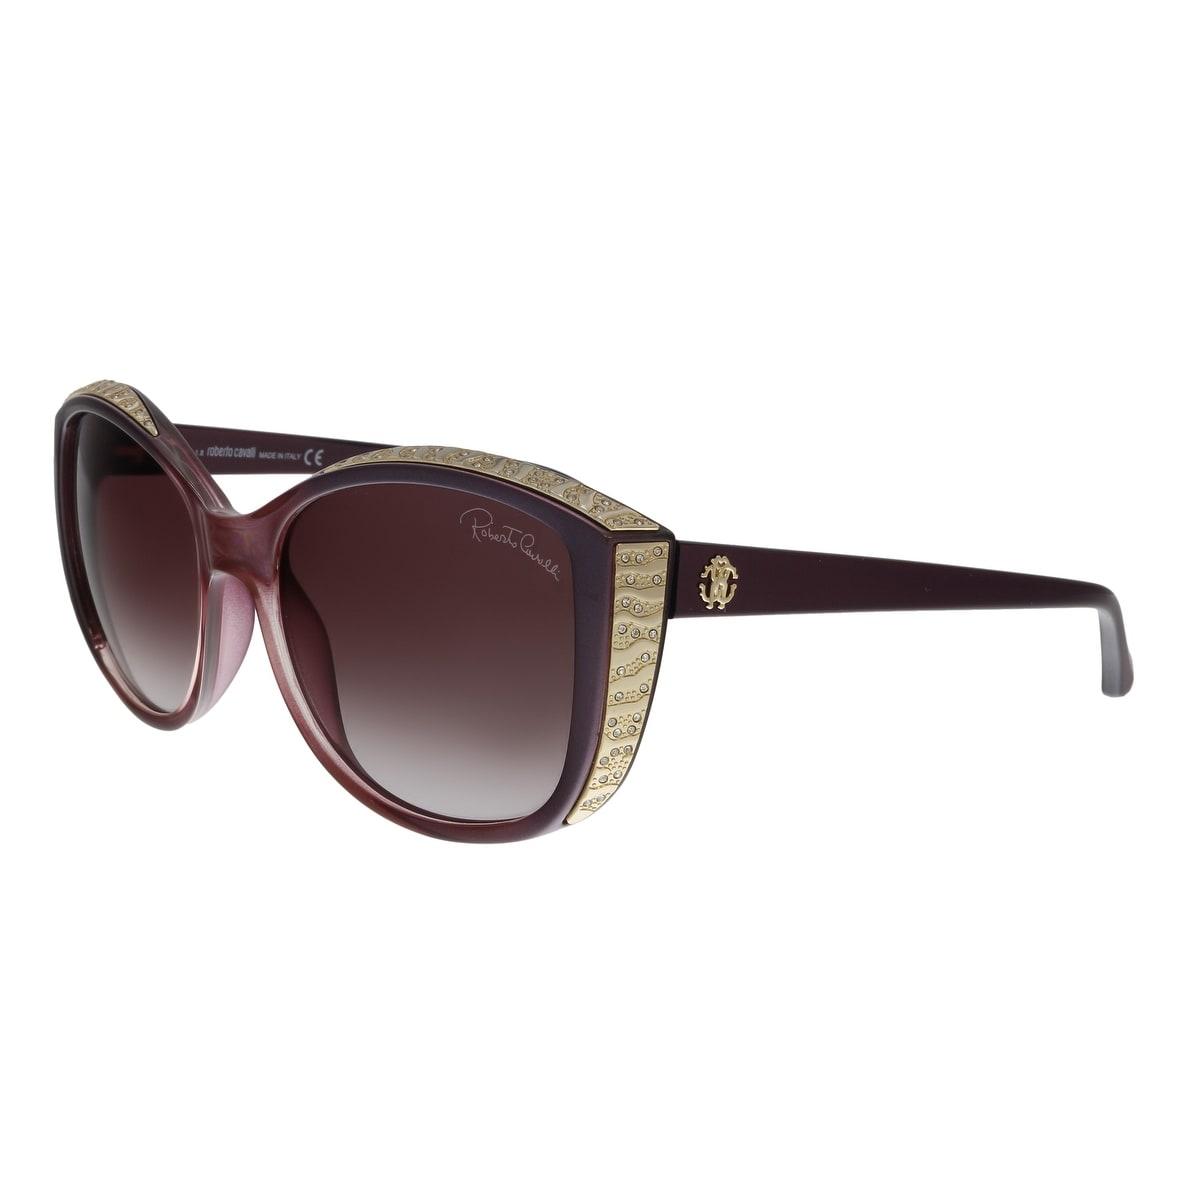 6659274c7a11f Roberto Cavalli Sunglasses